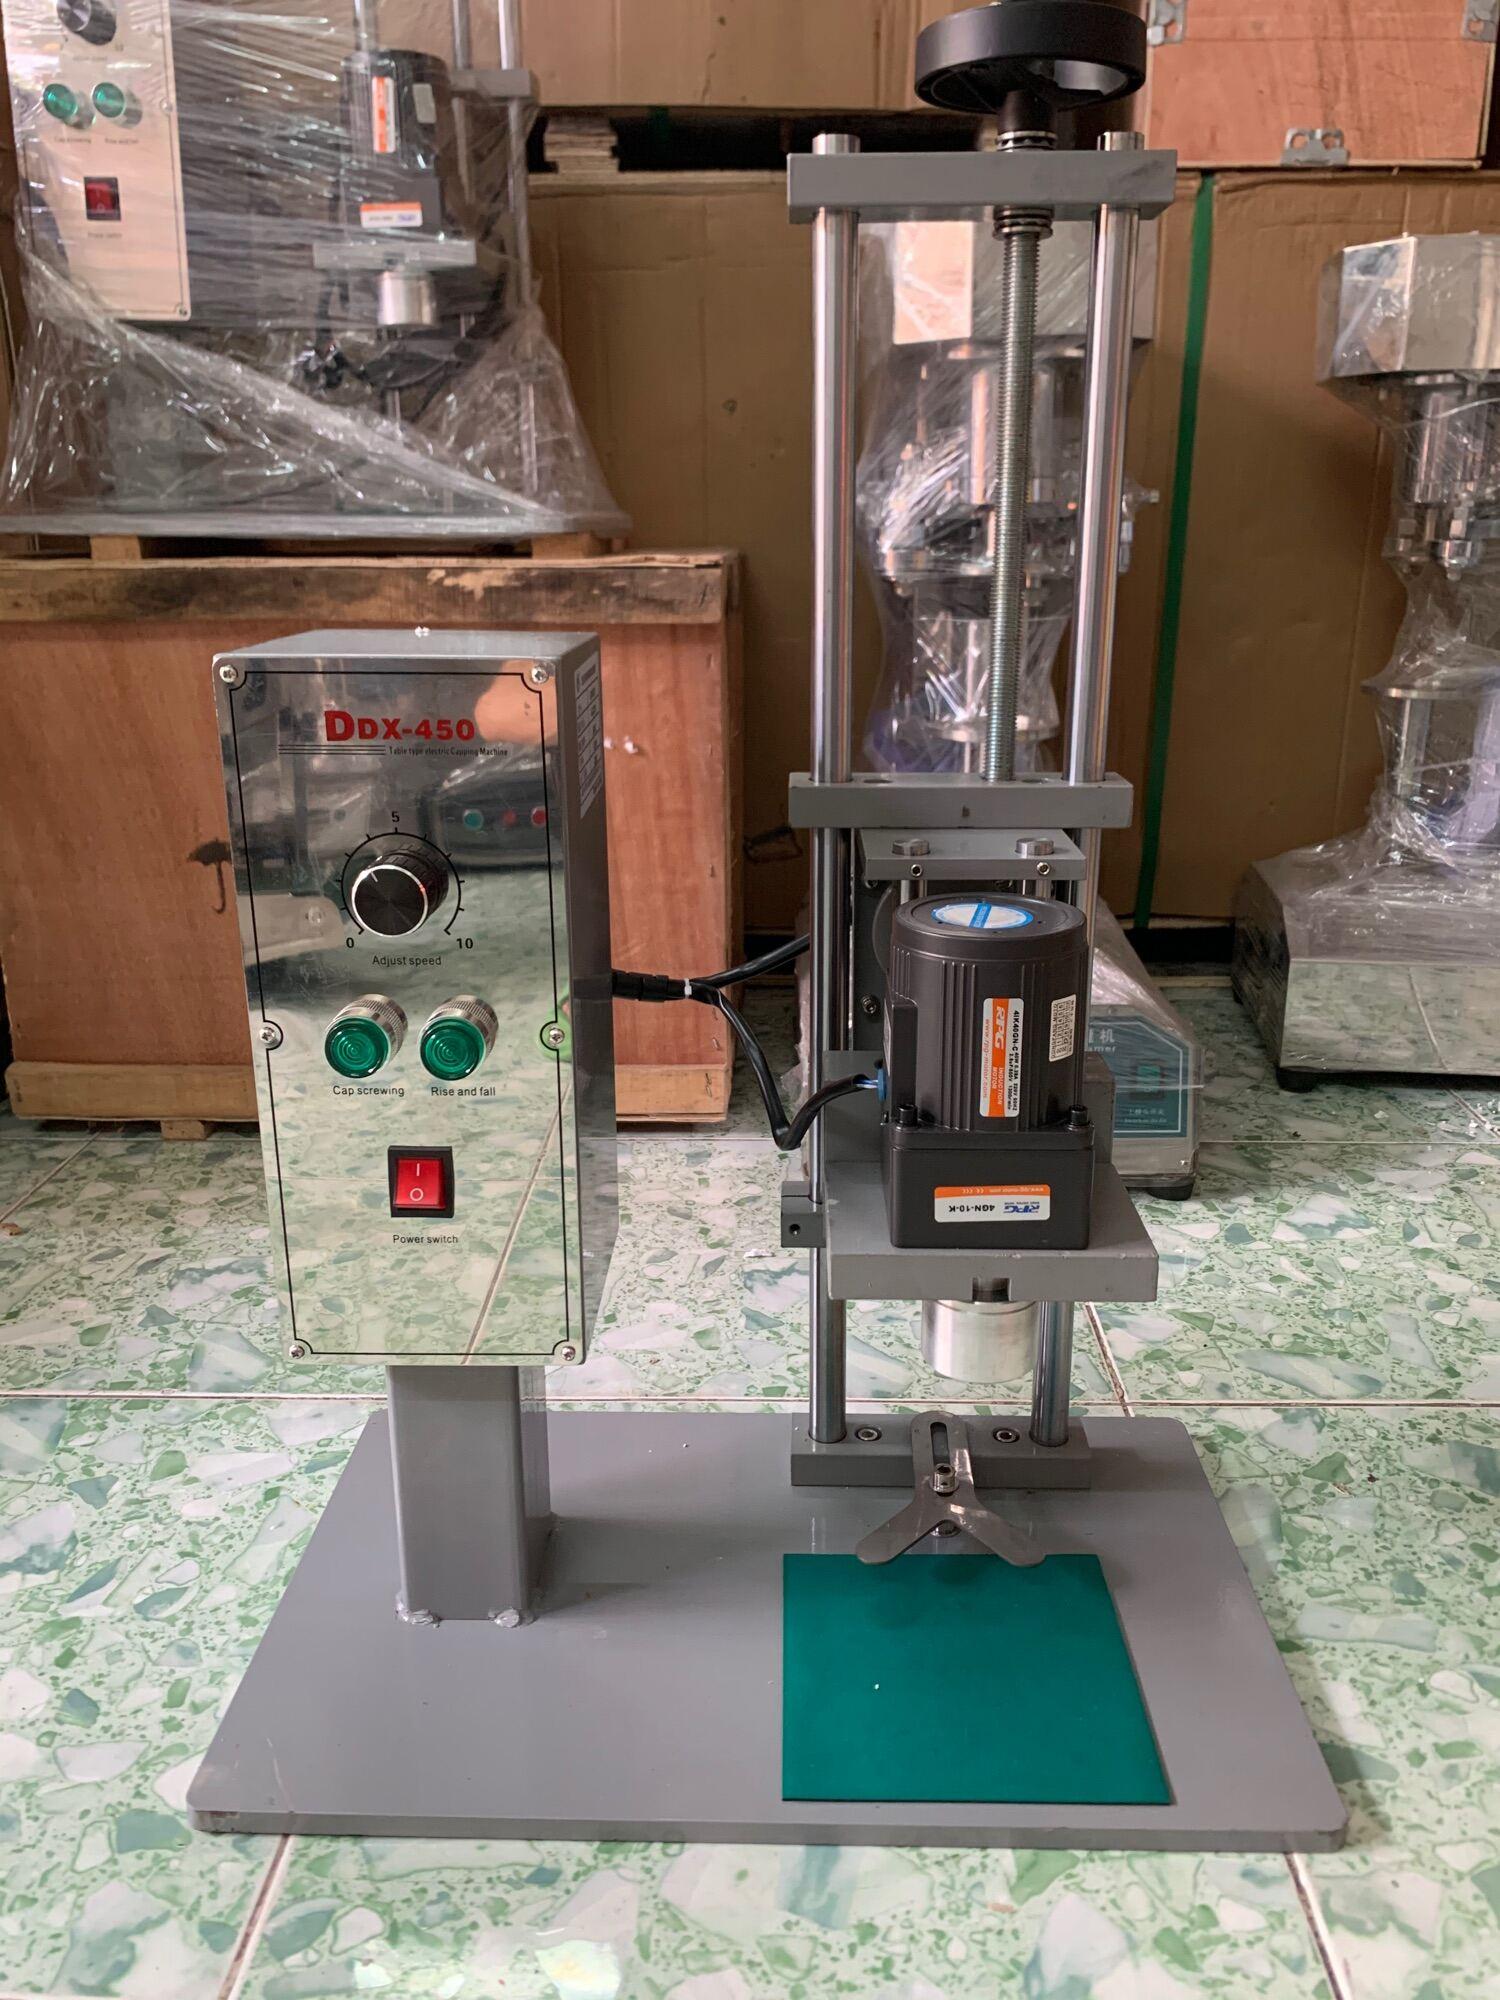 [HCM]Máy vặn nắp chai DDX 450